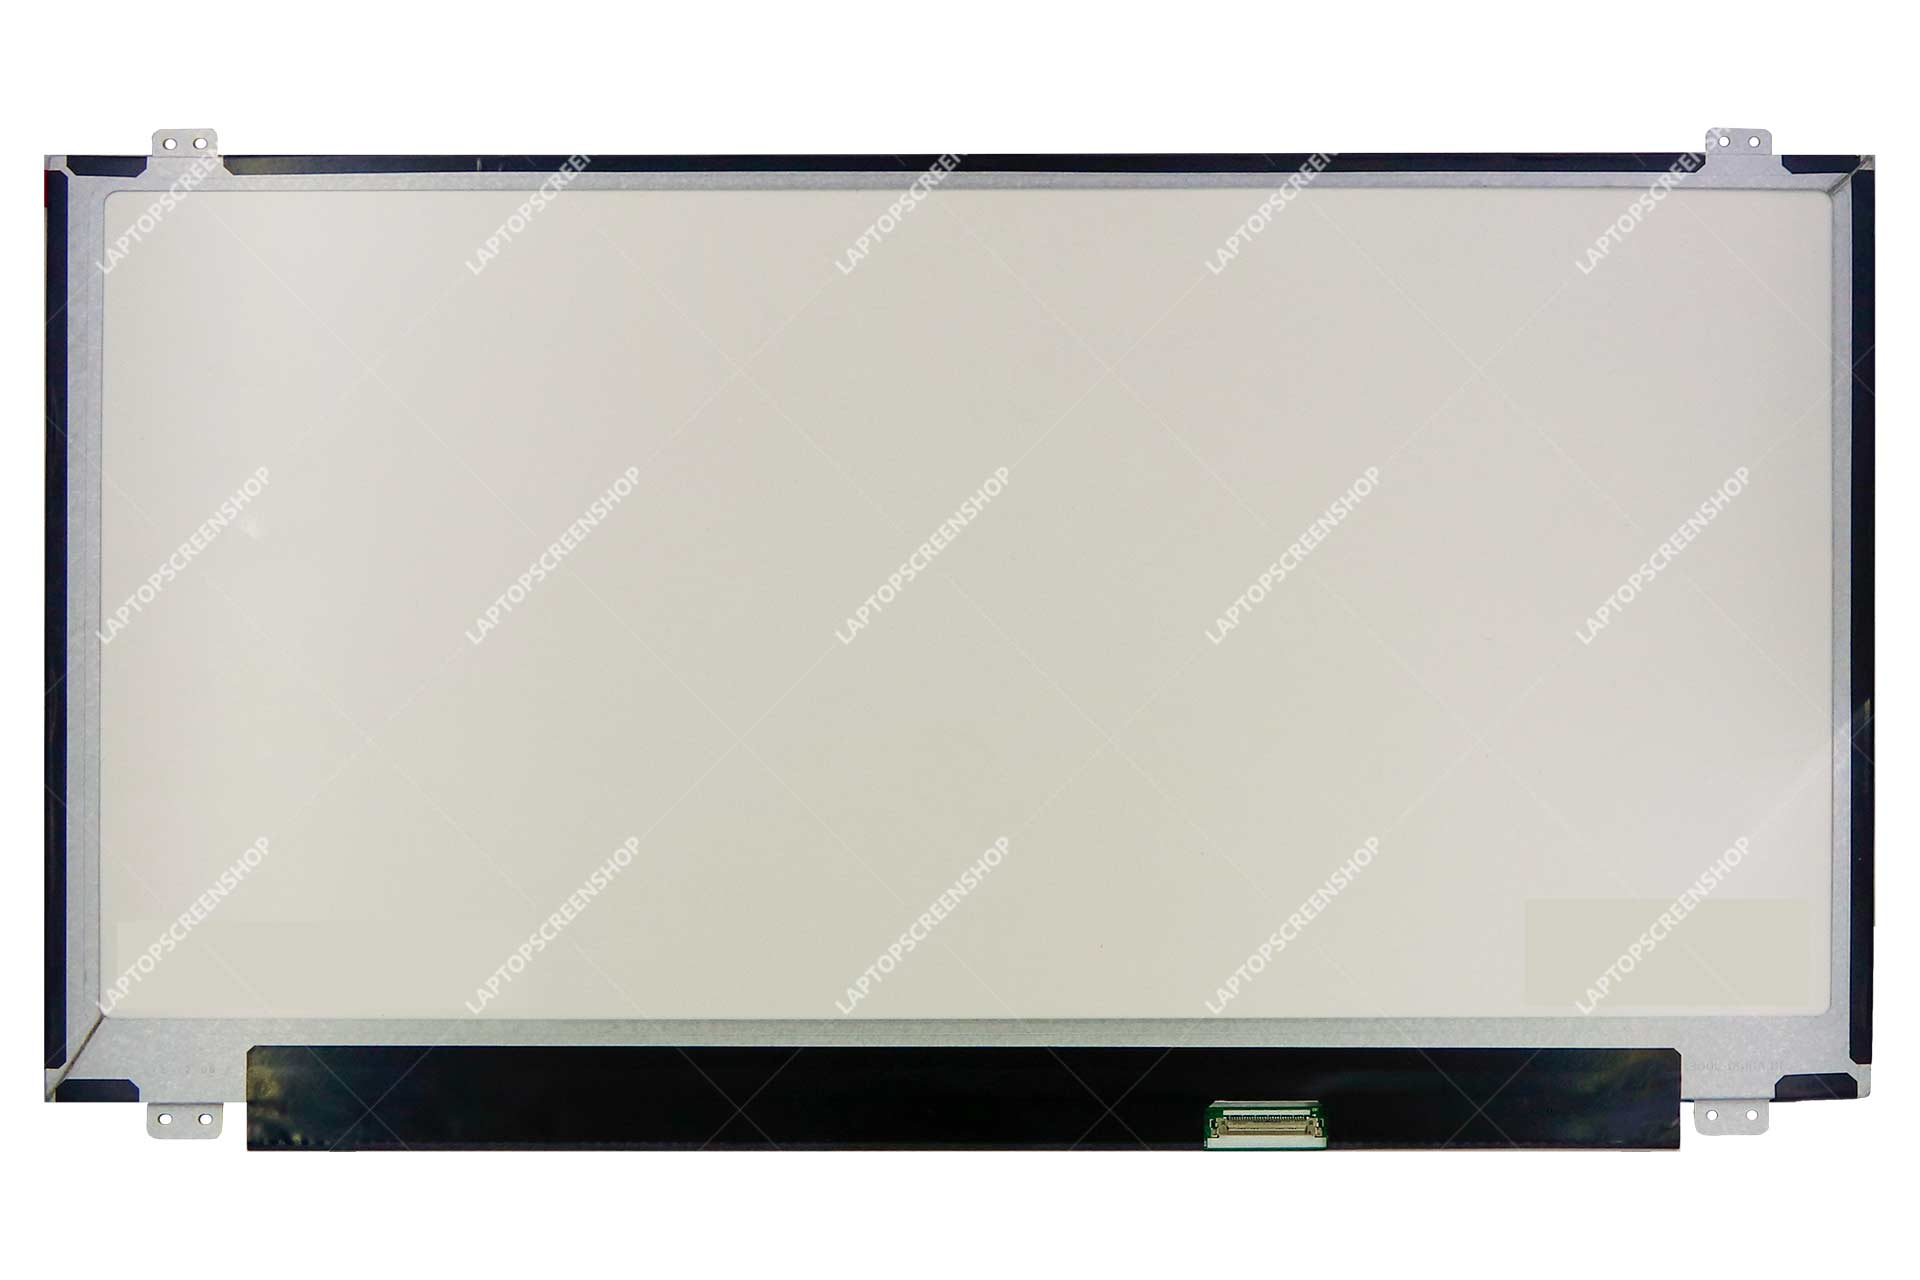 ACER-ASPIRE- E5-511-P34X-LCD |HD|فروشگاه لپ تاپ اسکرين | تعمير لپ تاپ